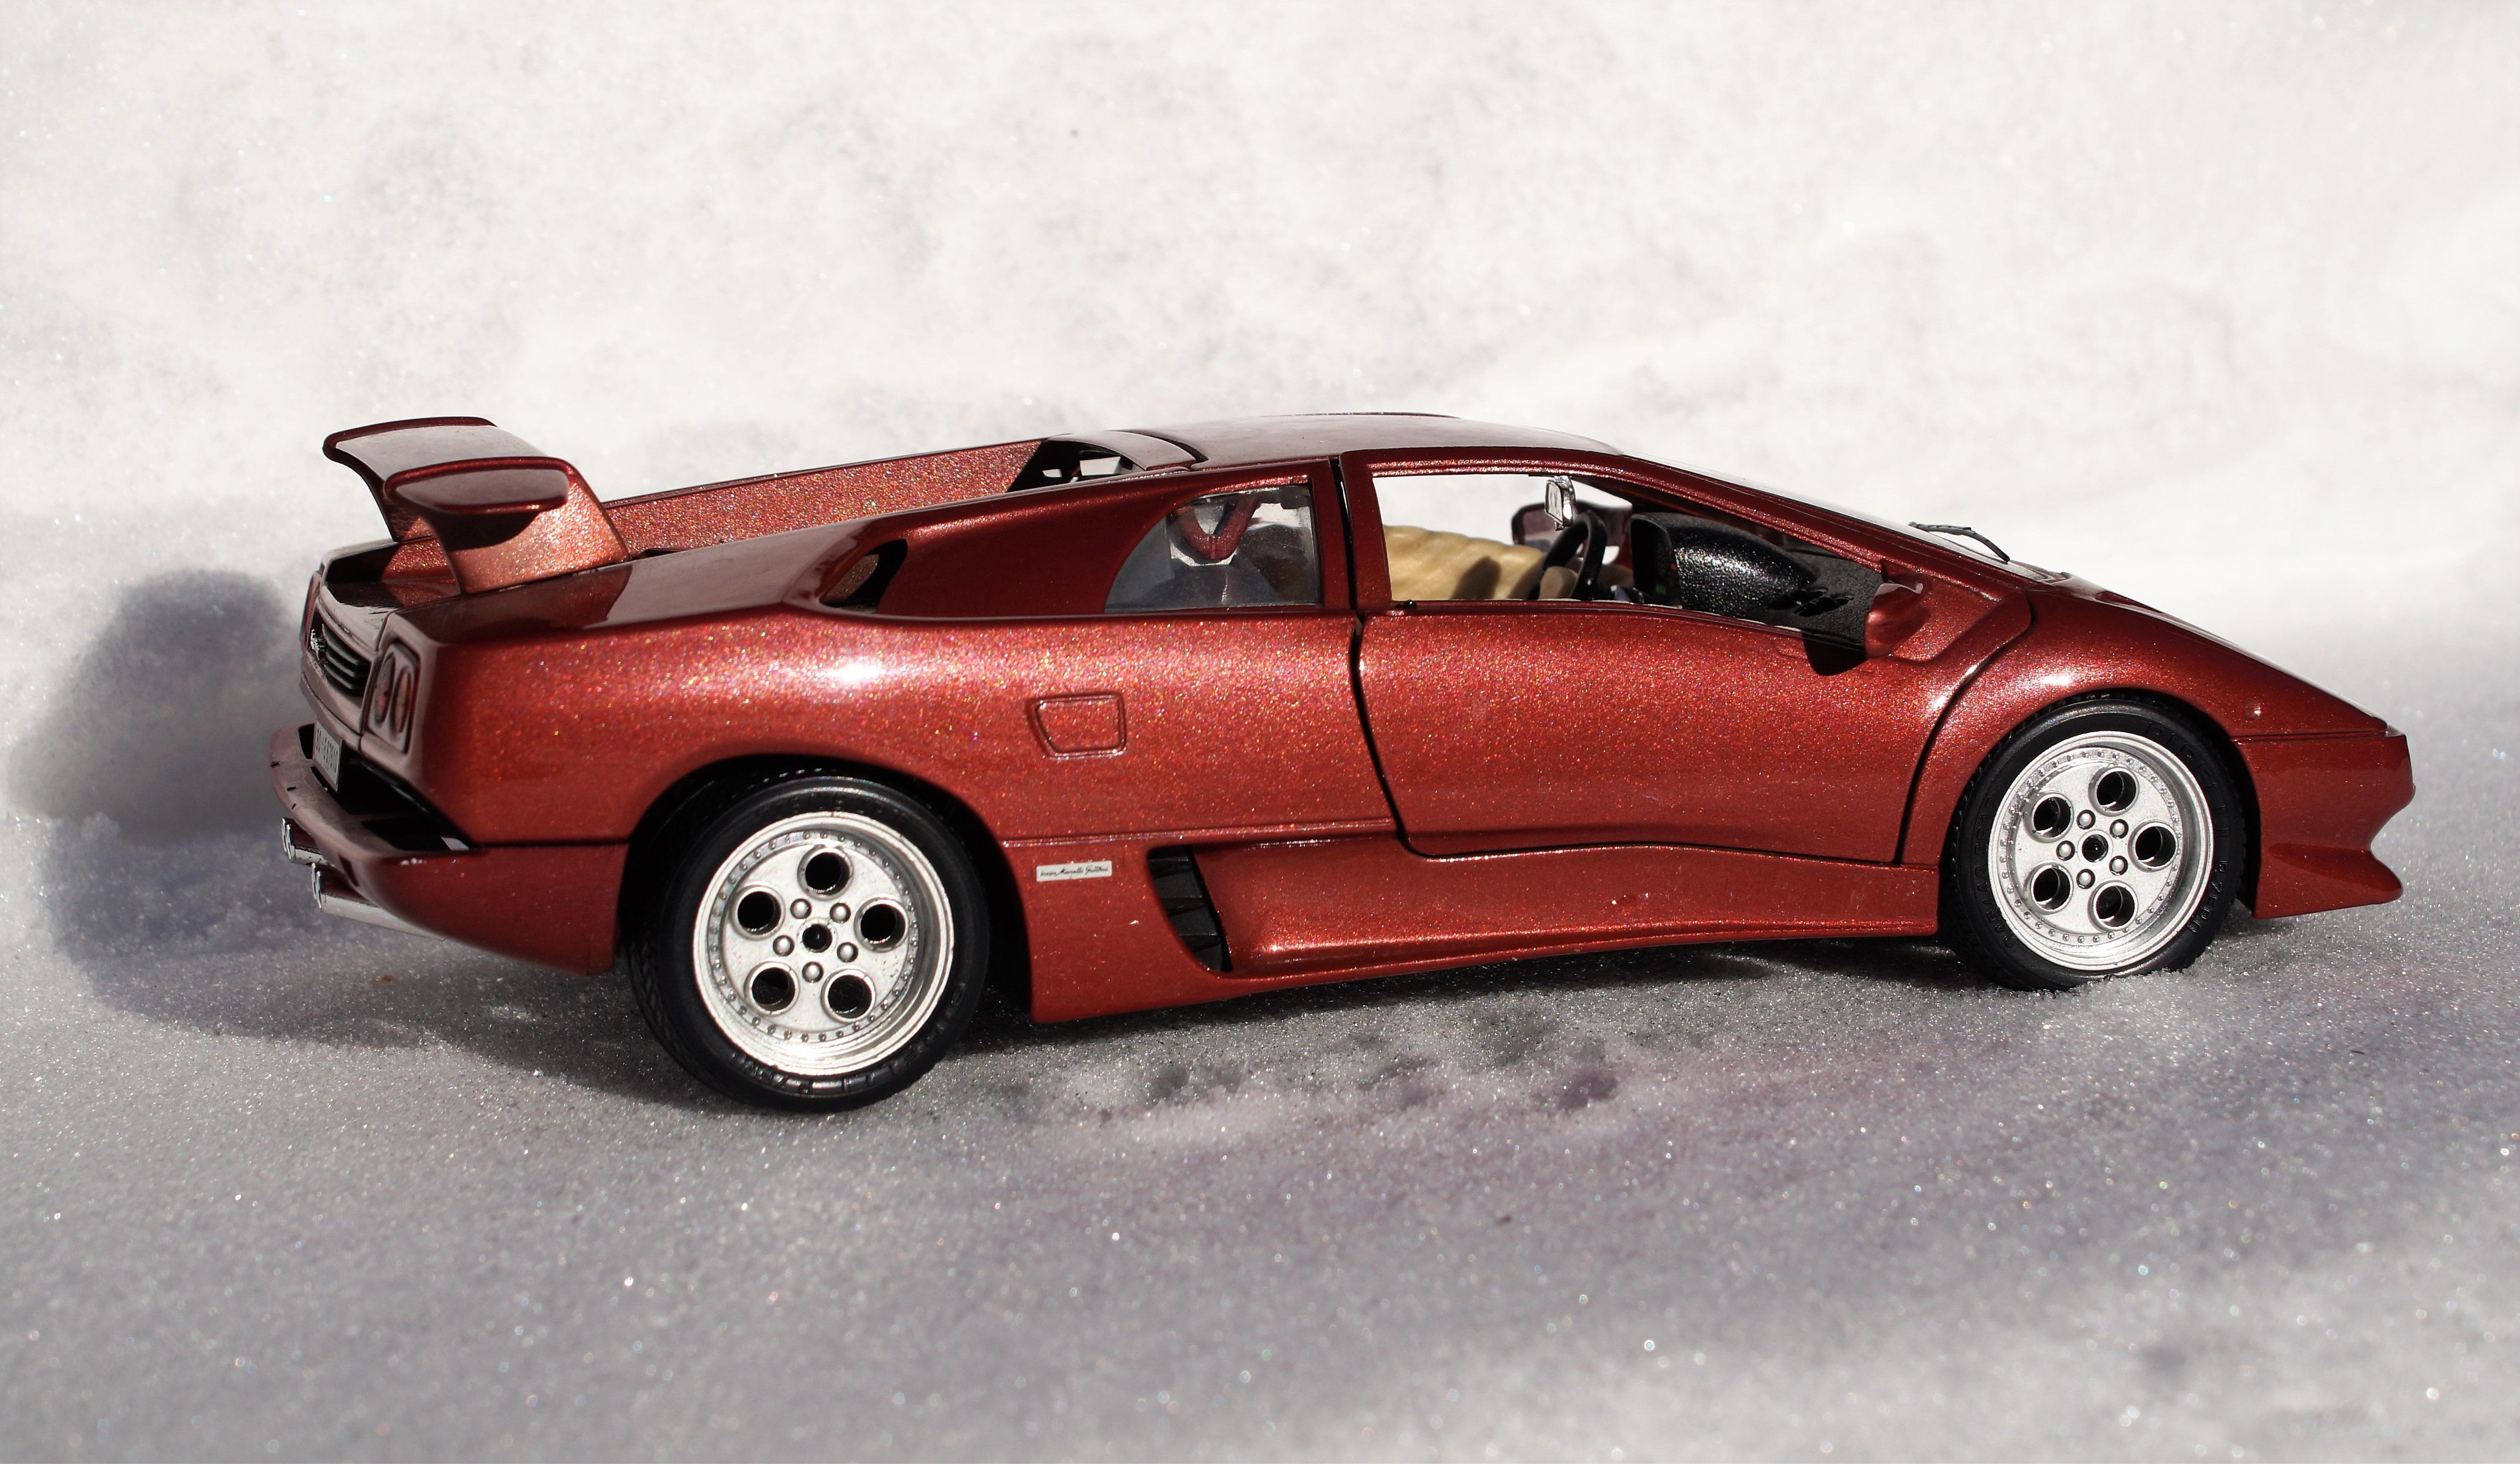 Snow Car Wheel Model Vehicle Auto Automotive Sports Car Supercar Toys  Oldtimer Lamborghini Vehicles Diablo Model